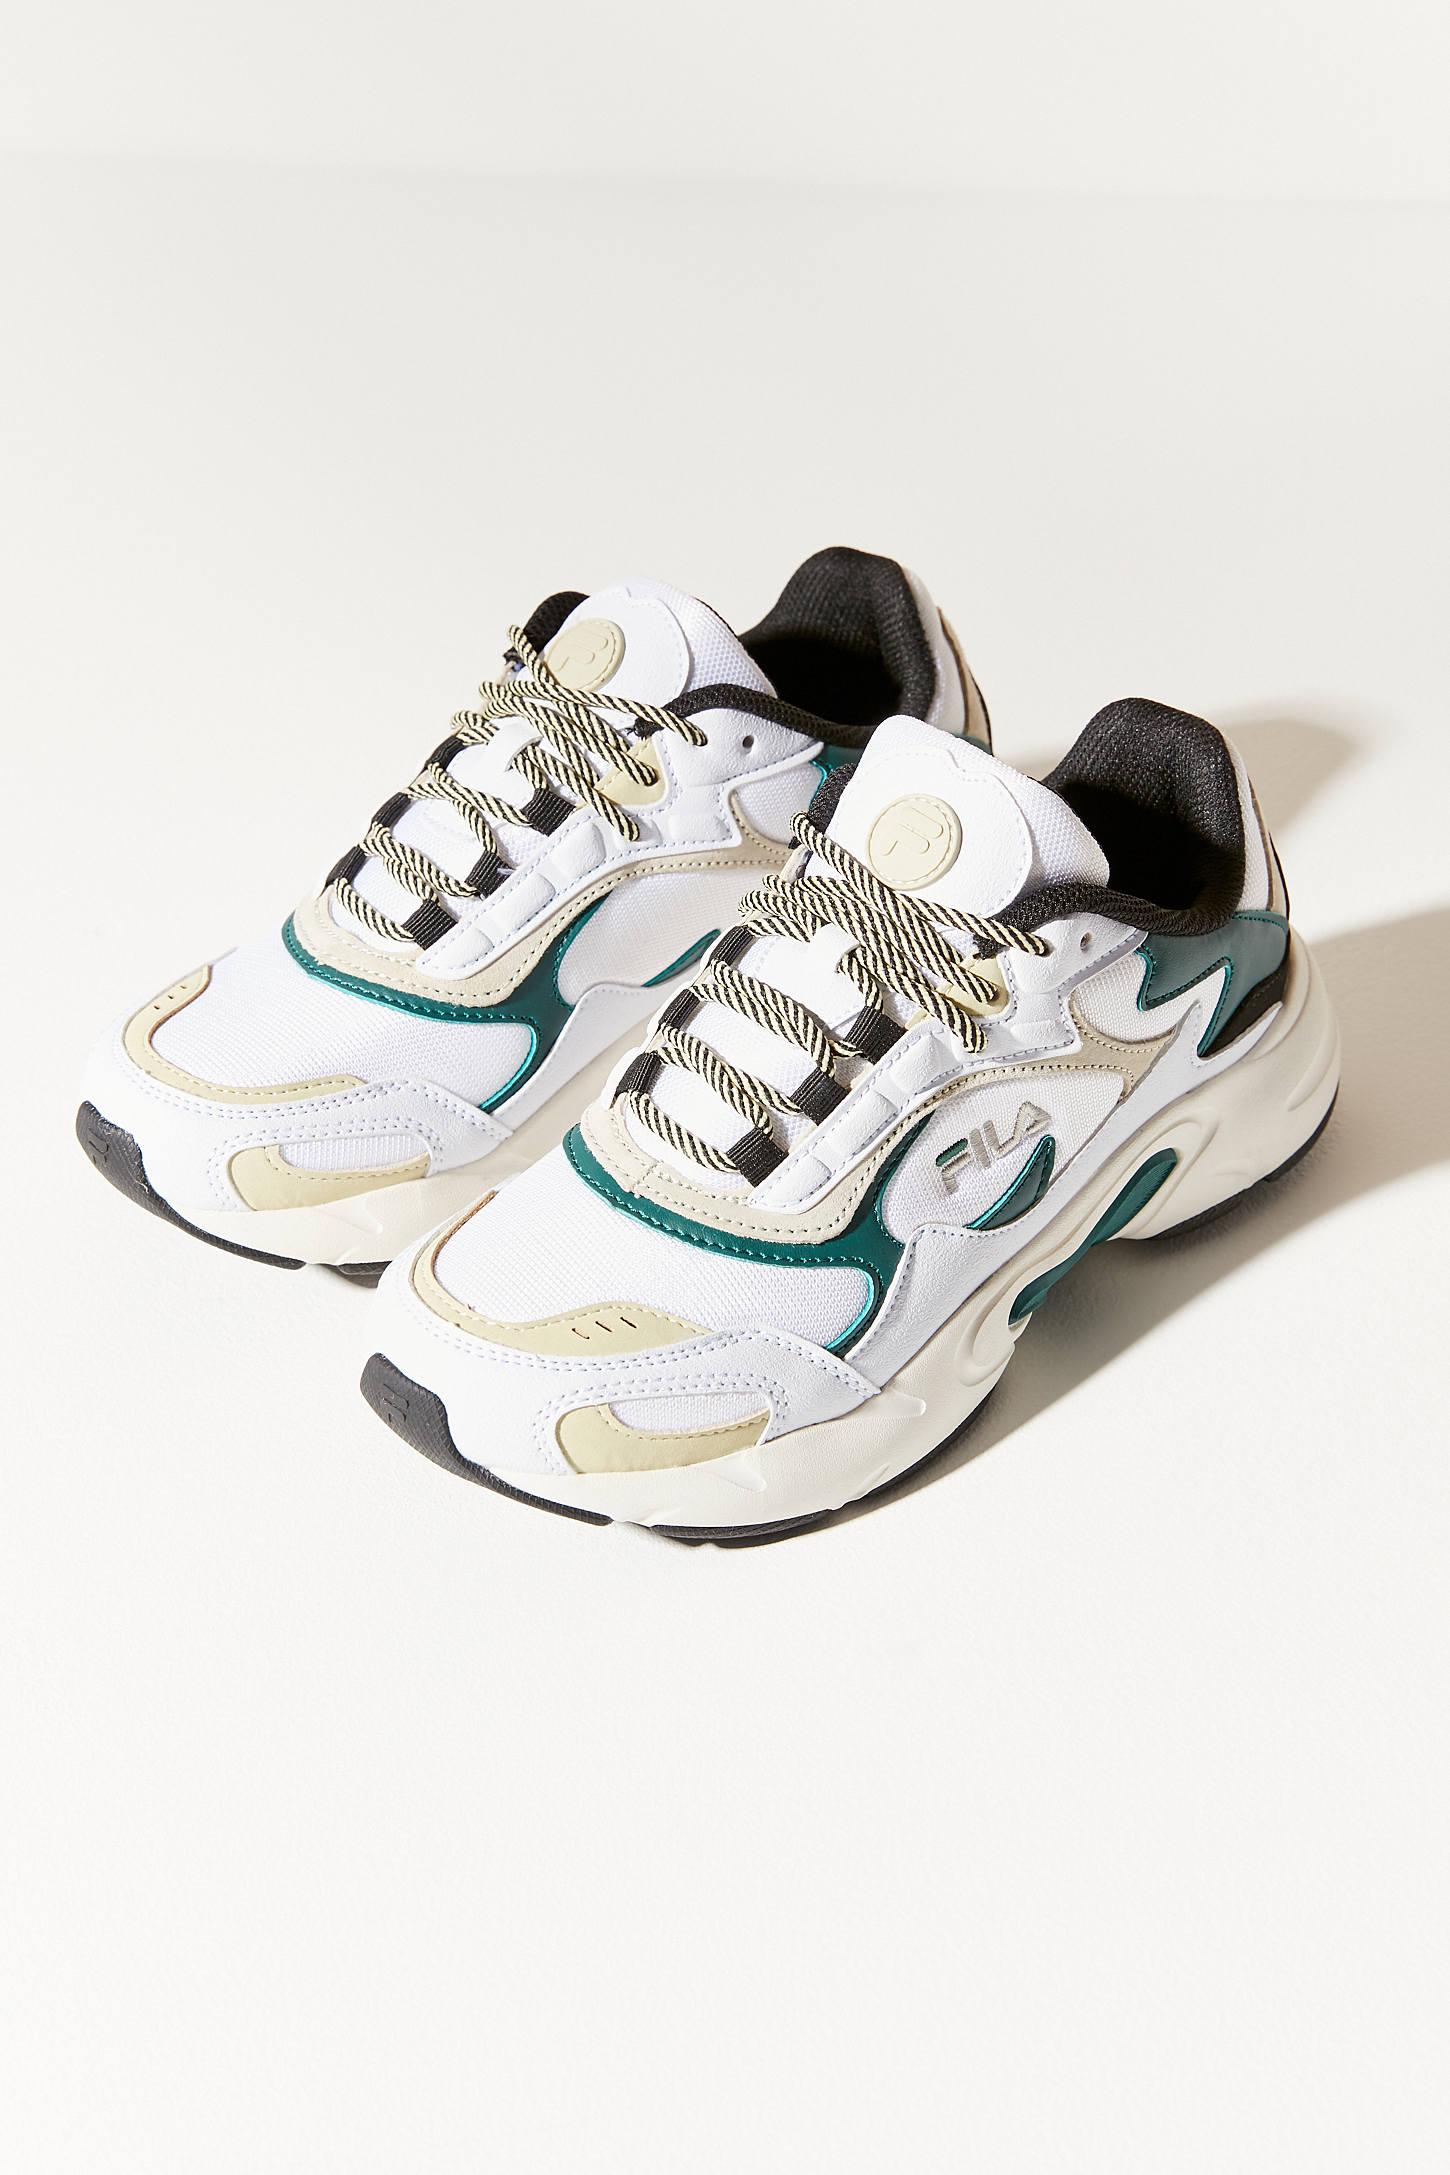 Fila + Luminance Sneaker